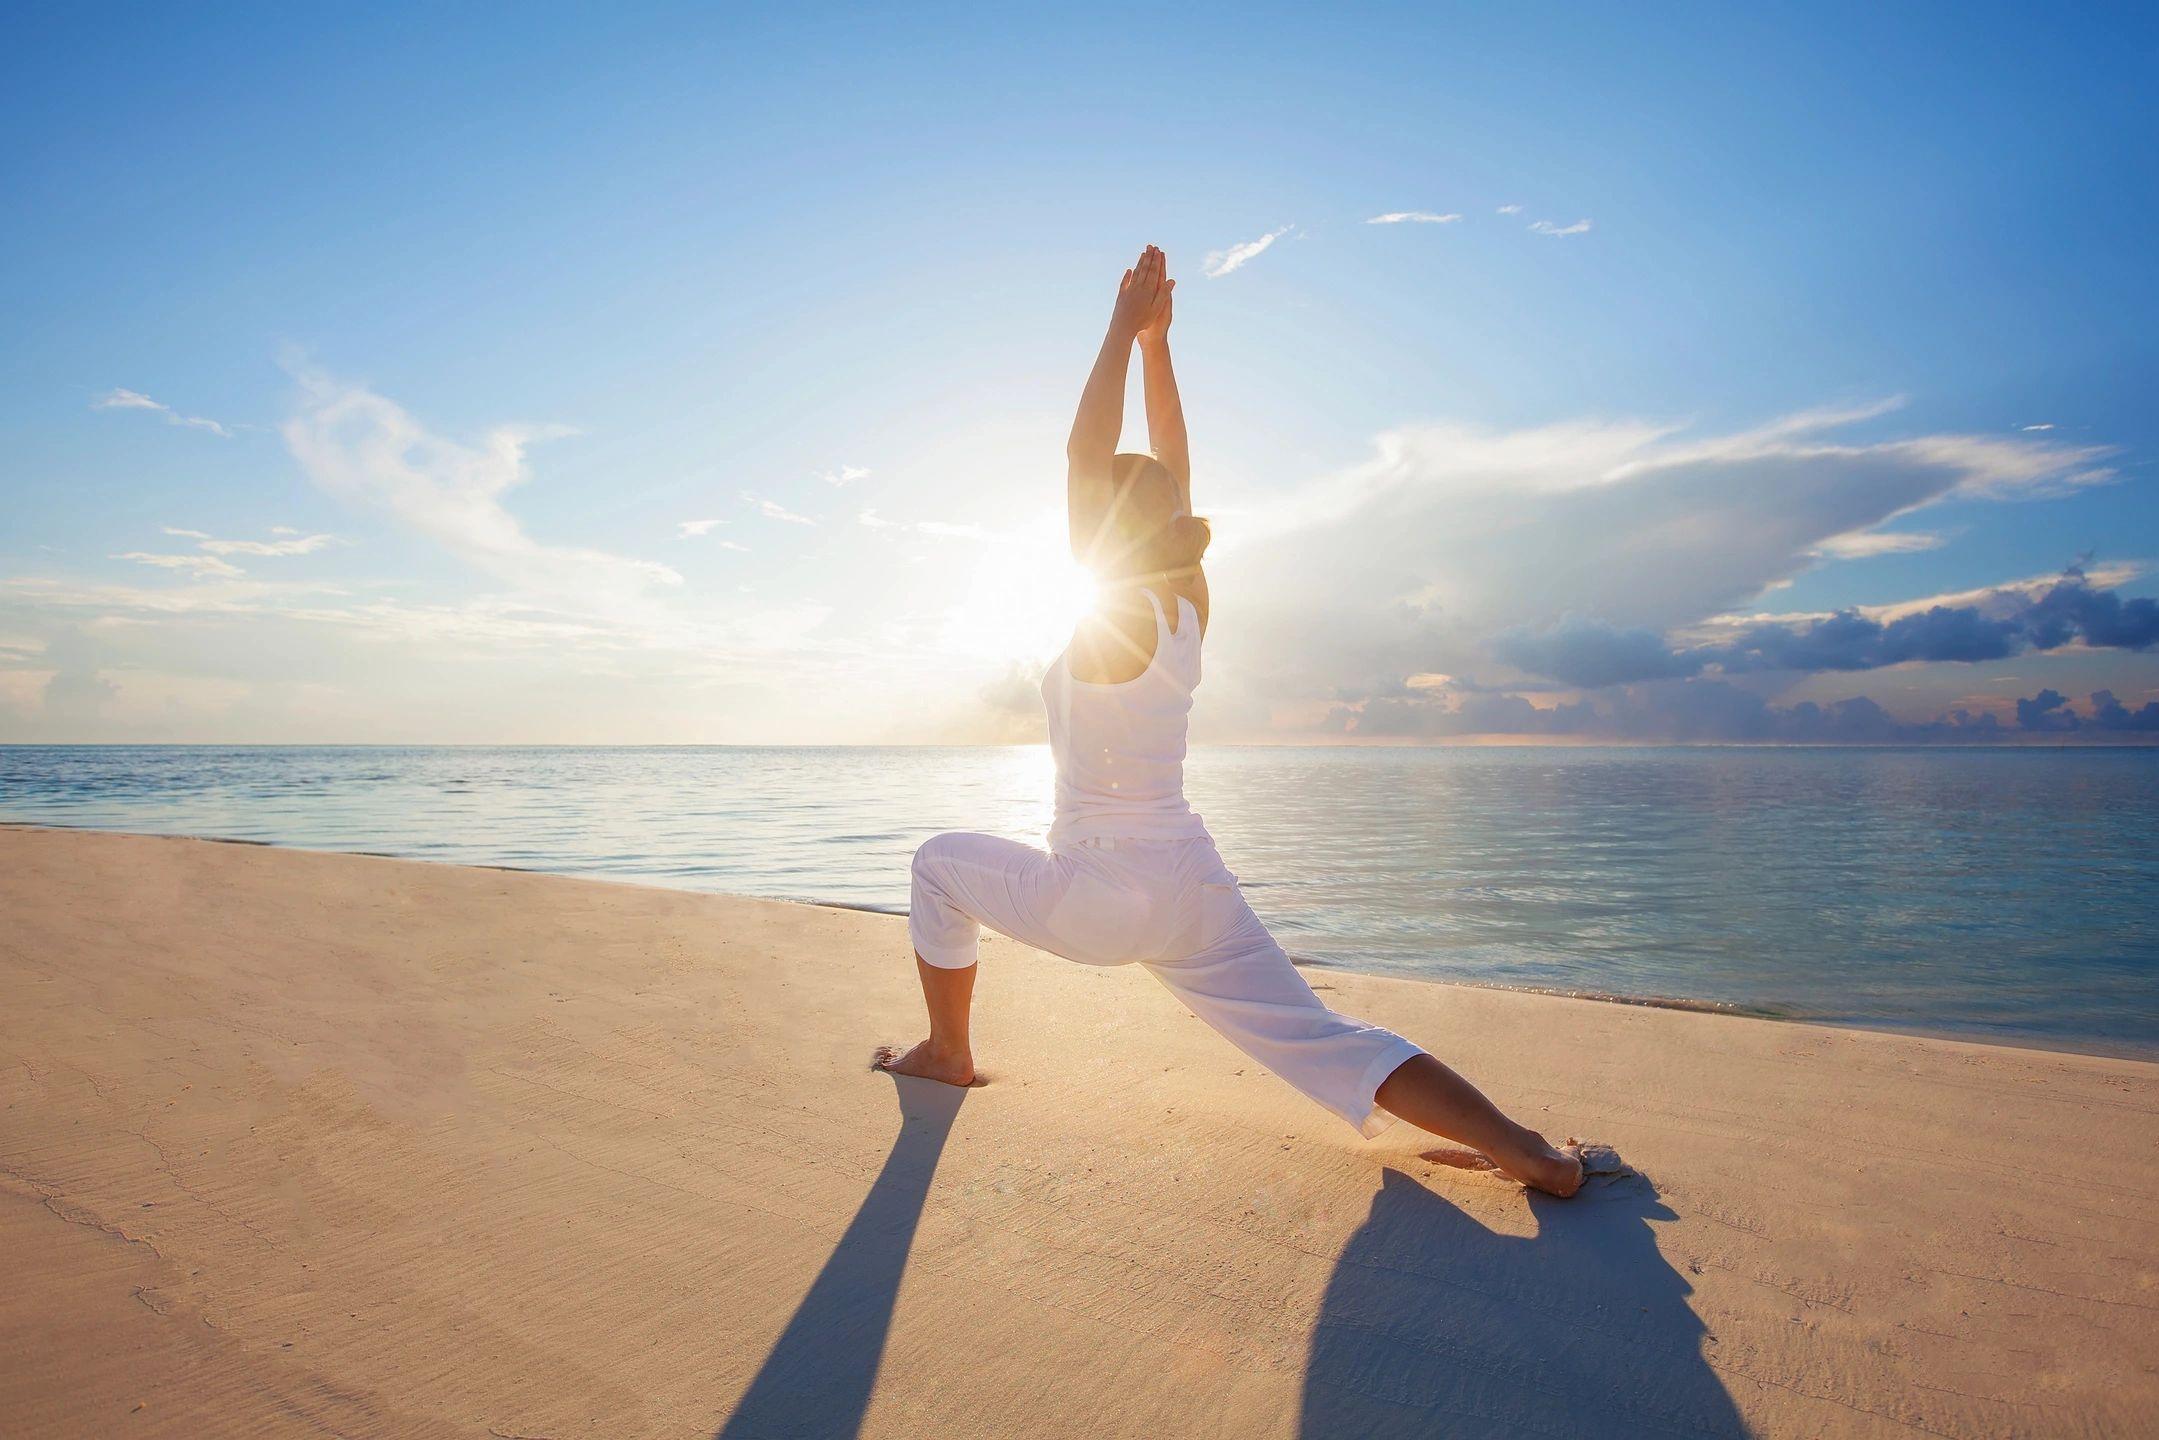 Pacific Blue Yoga Yoga In Laguna Beach Hot Yoga In Laguna Beach